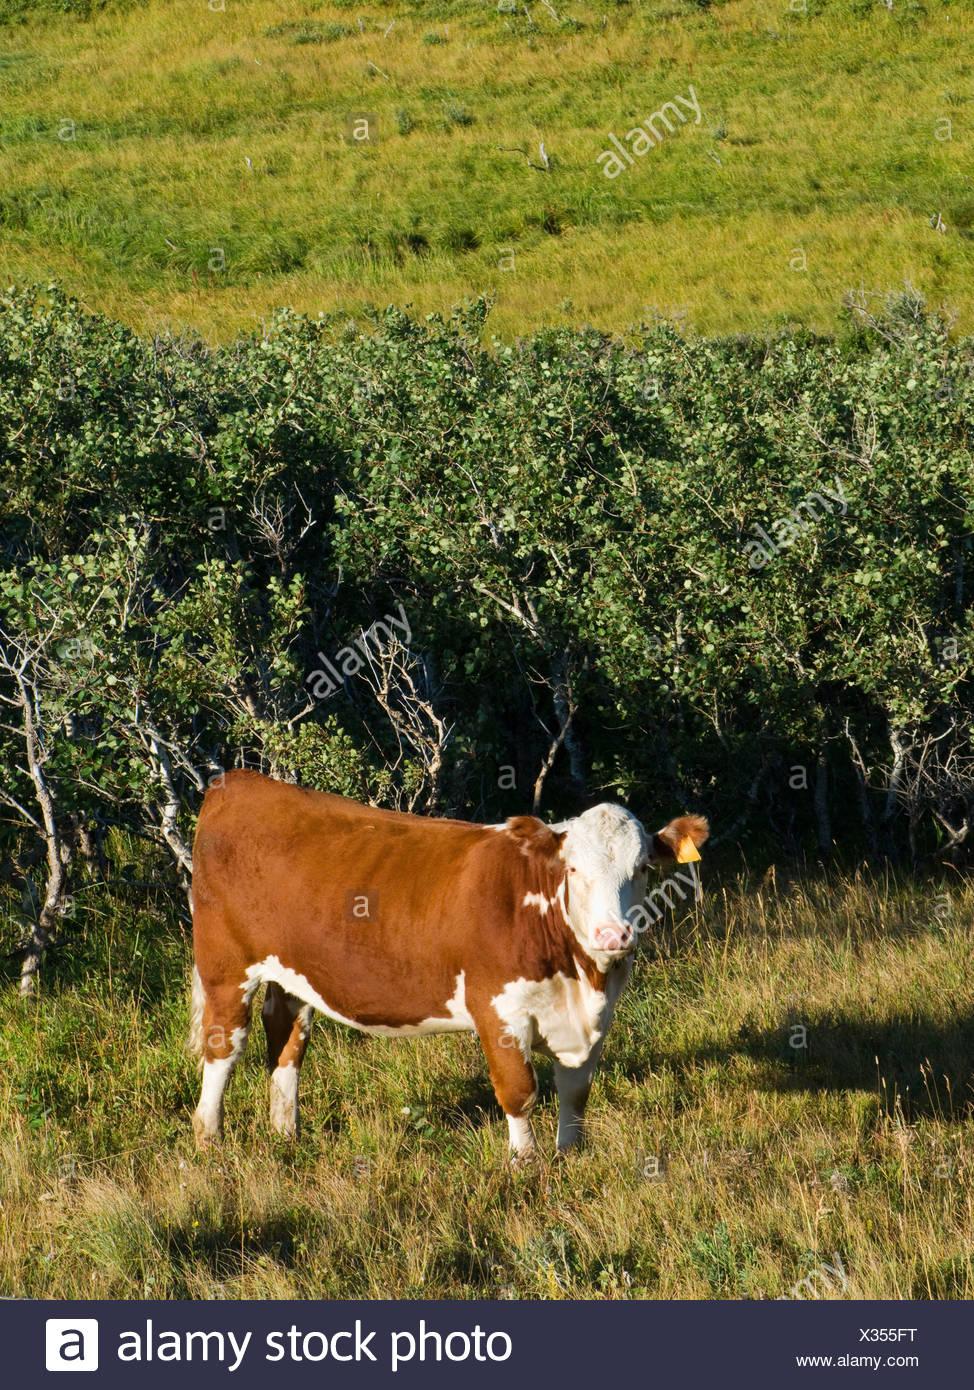 Livestock - Hereford heifer on native mountain rangeland / Alberta, Canada. - Stock Image